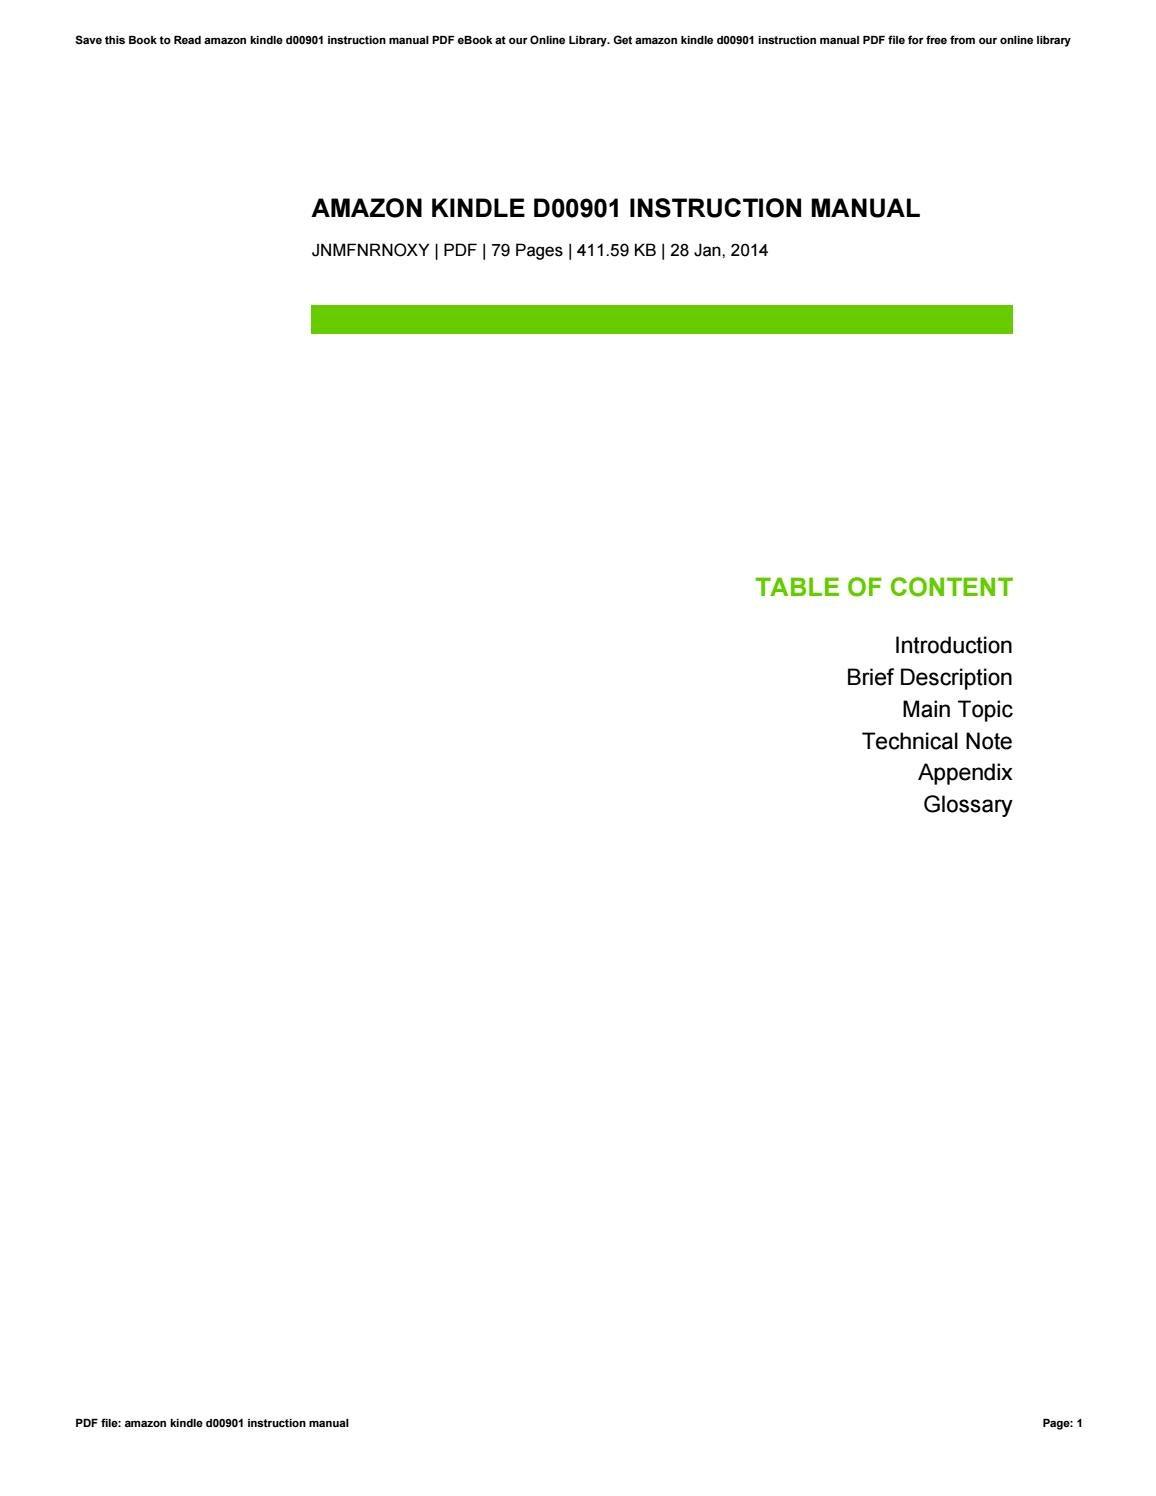 amazon kindle d00901 manual pdf